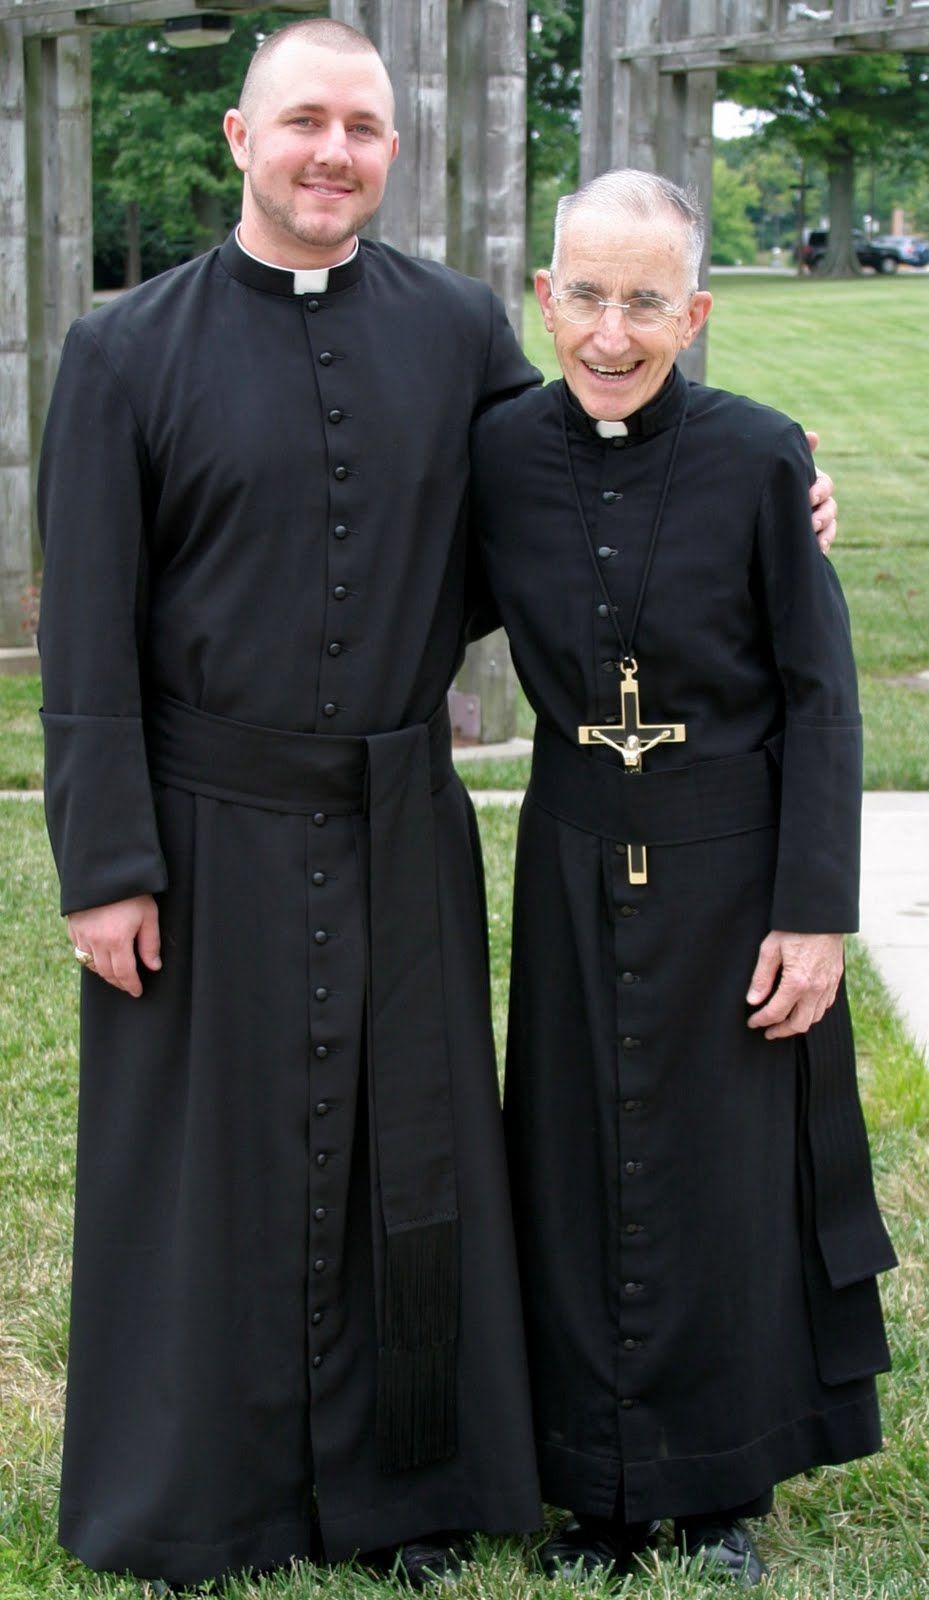 Catholic Priest Clothing   www.pixshark.com - Images ...